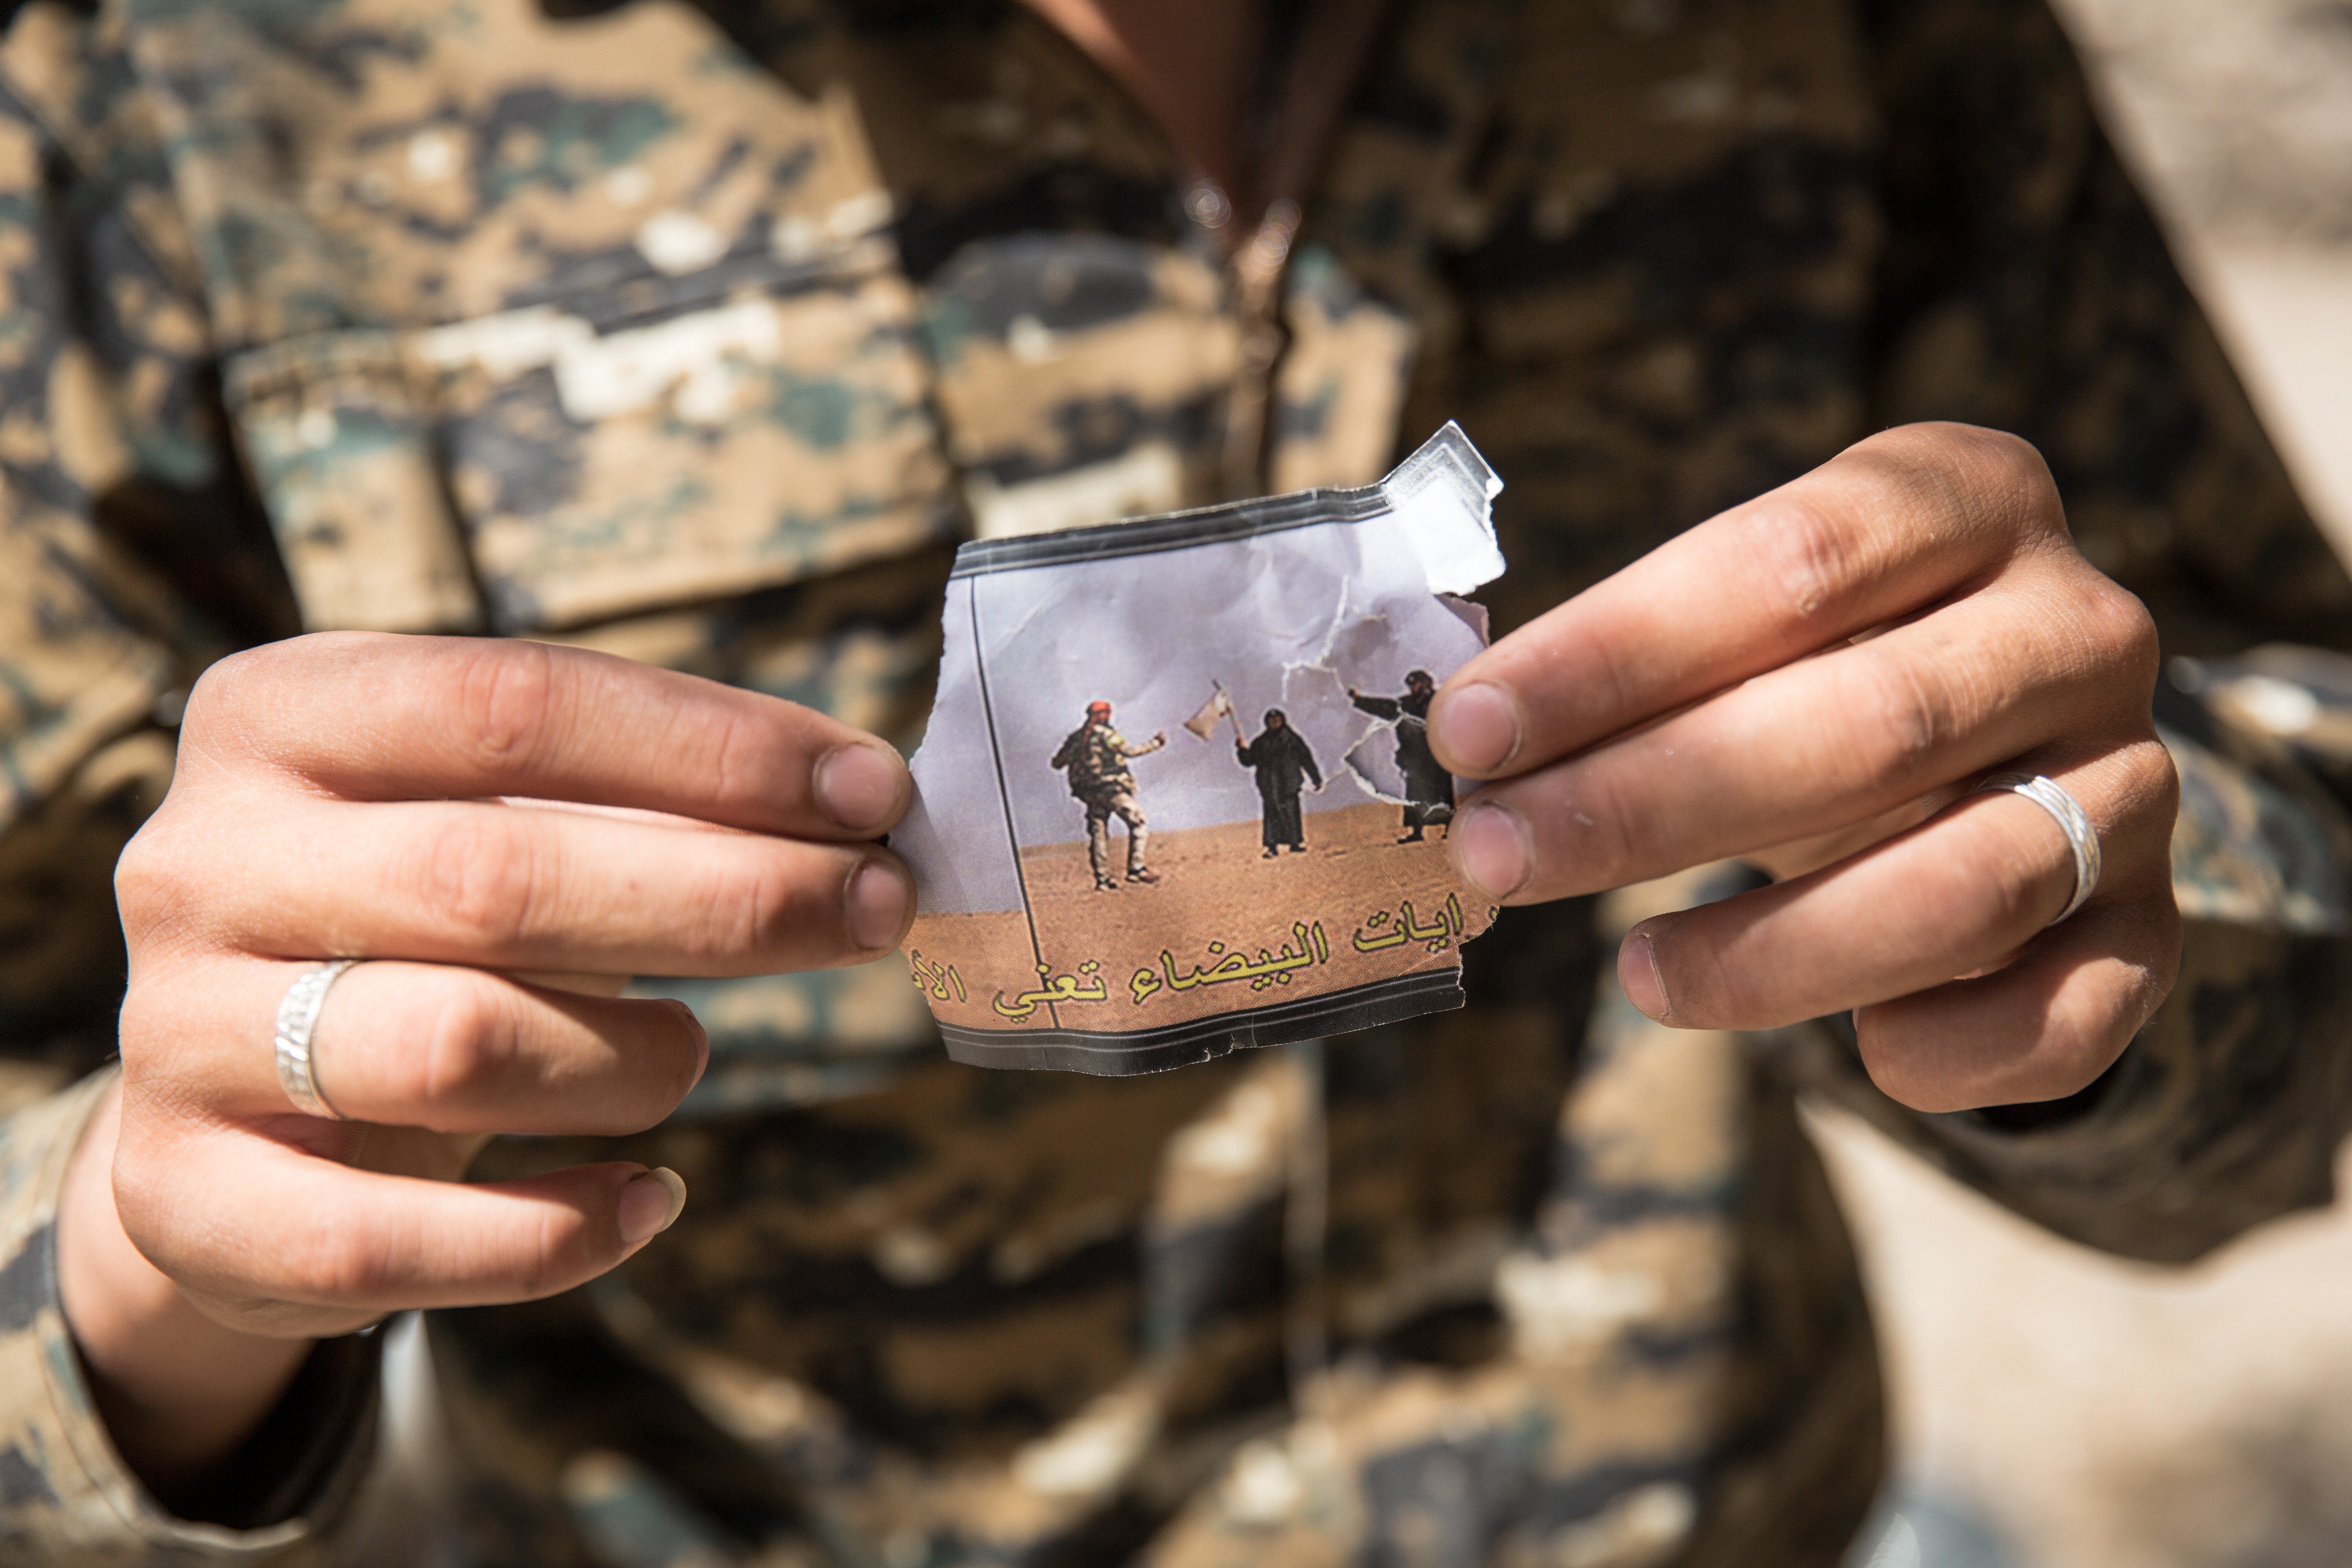 Syrian Democratic Forces Conquers Daesh In Raqqa